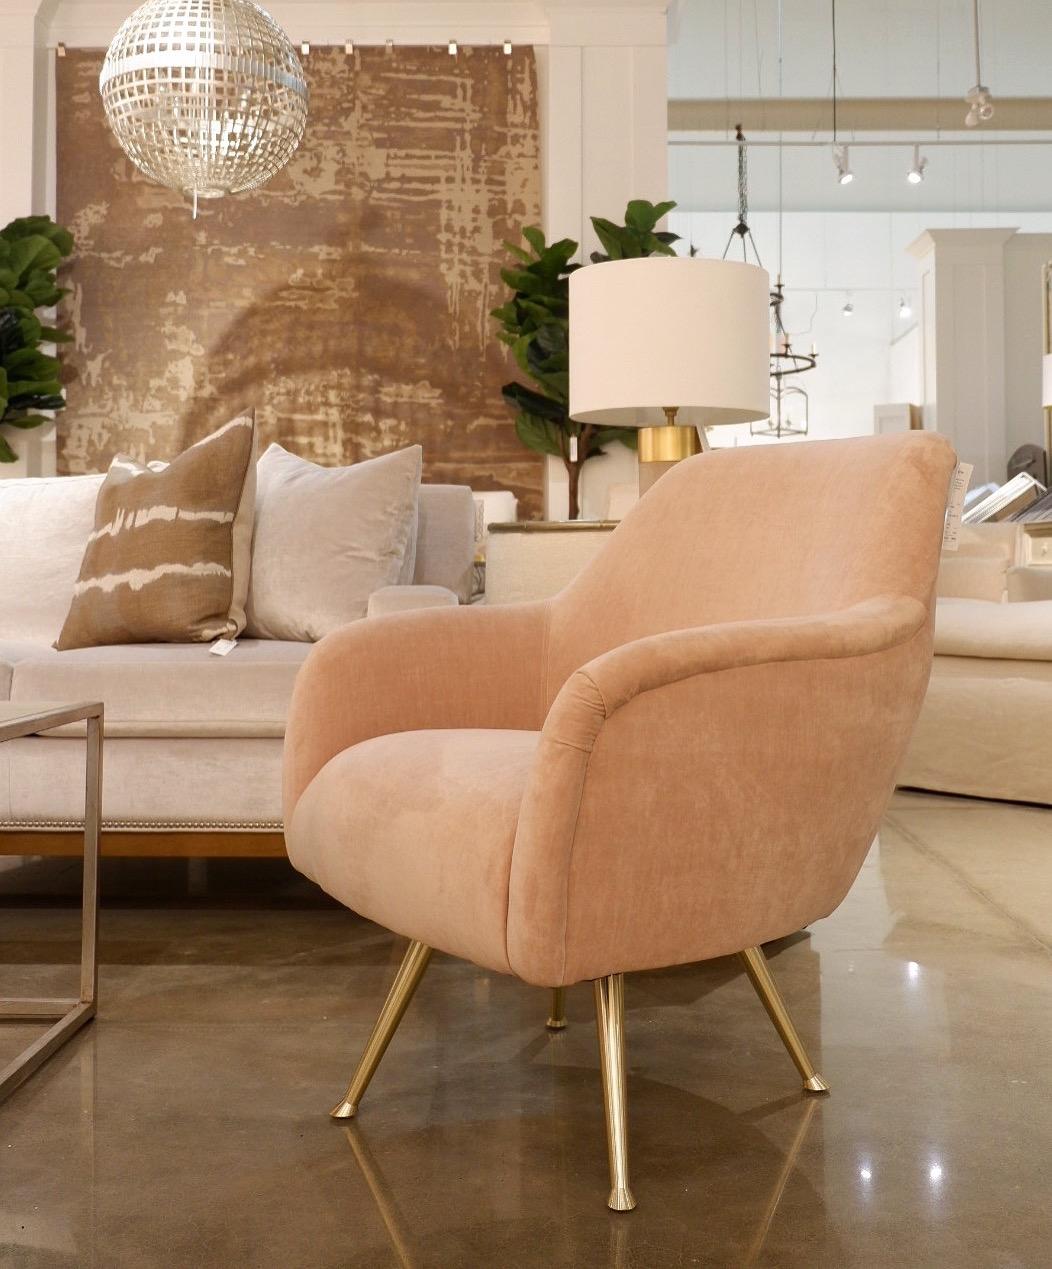 Cocoon-furnishings-LeeIndustrieschair-thedesignedit.jpg